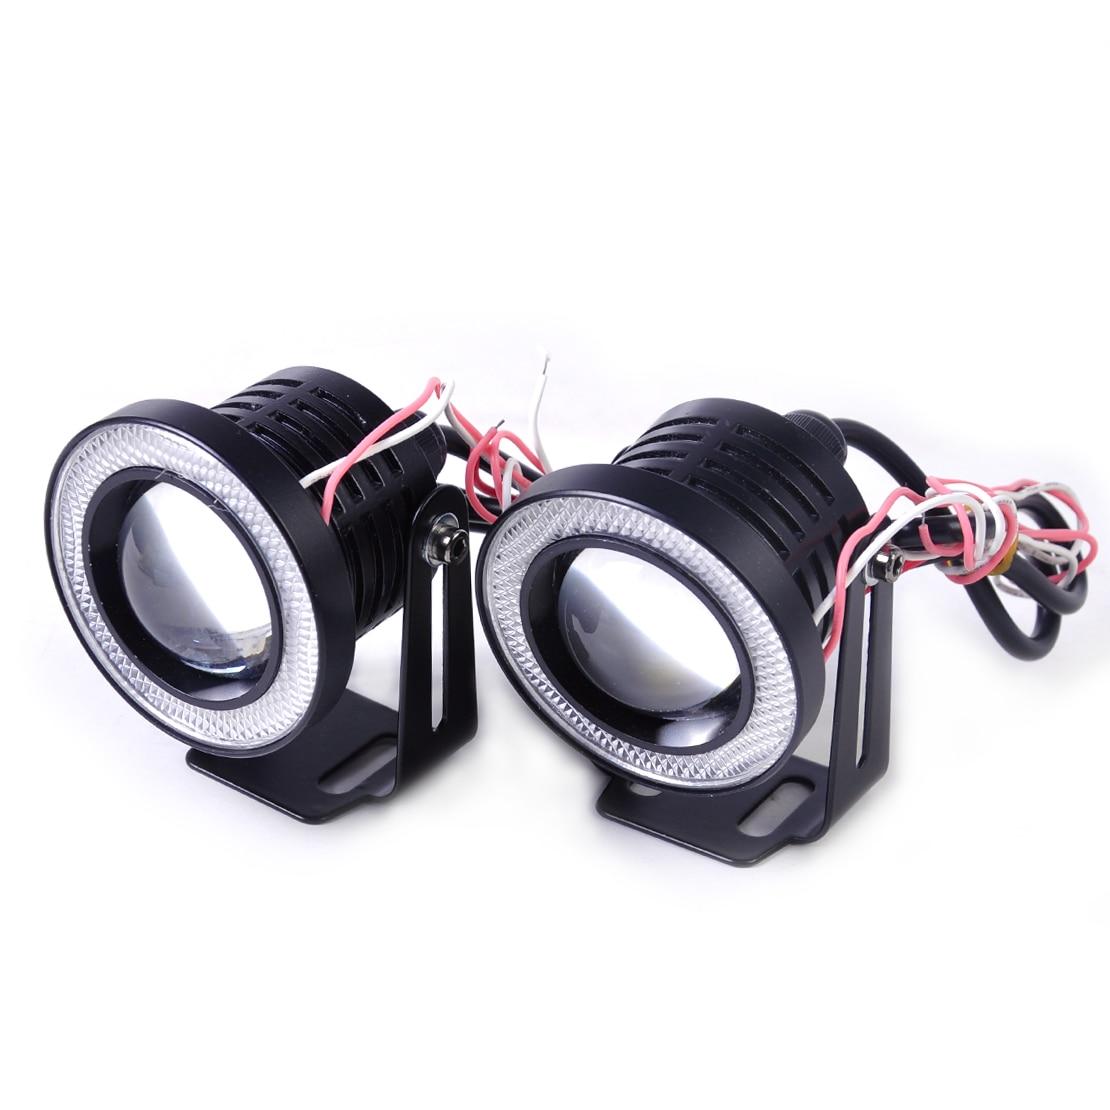 цена на CITALL Universal 2.5 64mm 10W White LED Projector Fog Lens DRL Driving Light w Blue LED Angel Eye Halo Ring For Ford VW Audi VW